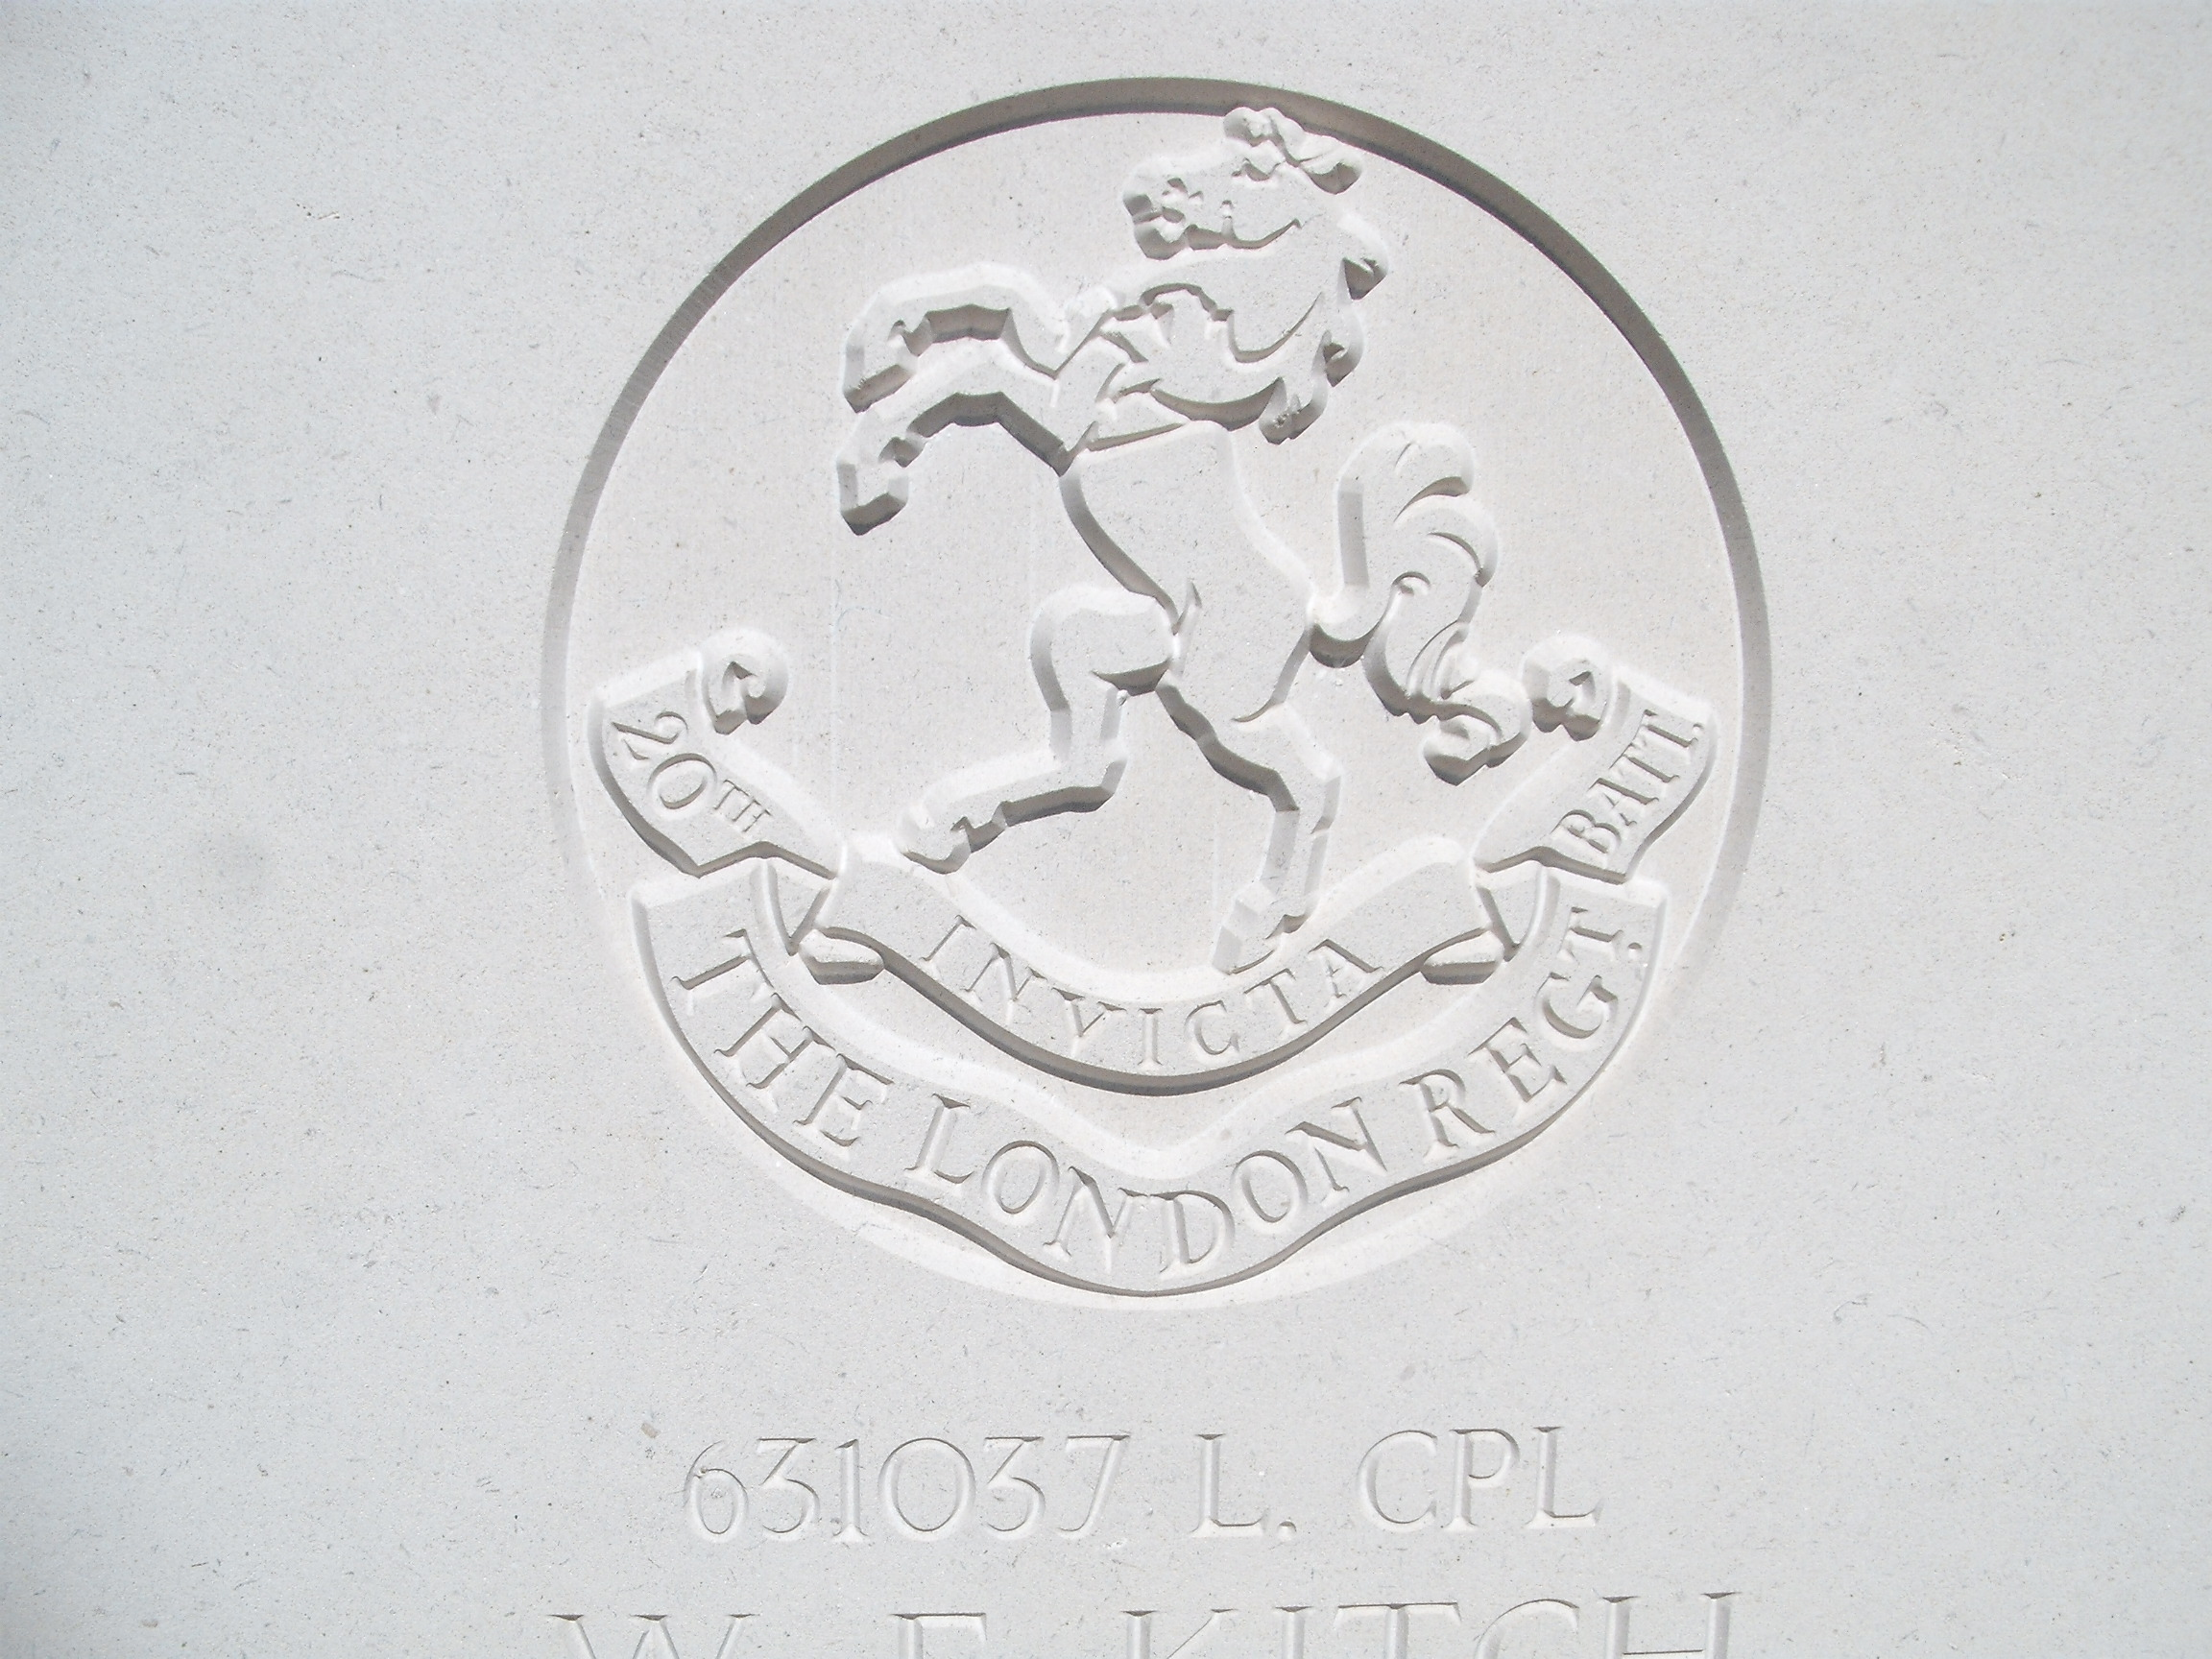 Capbadge of the 20th London Regiment